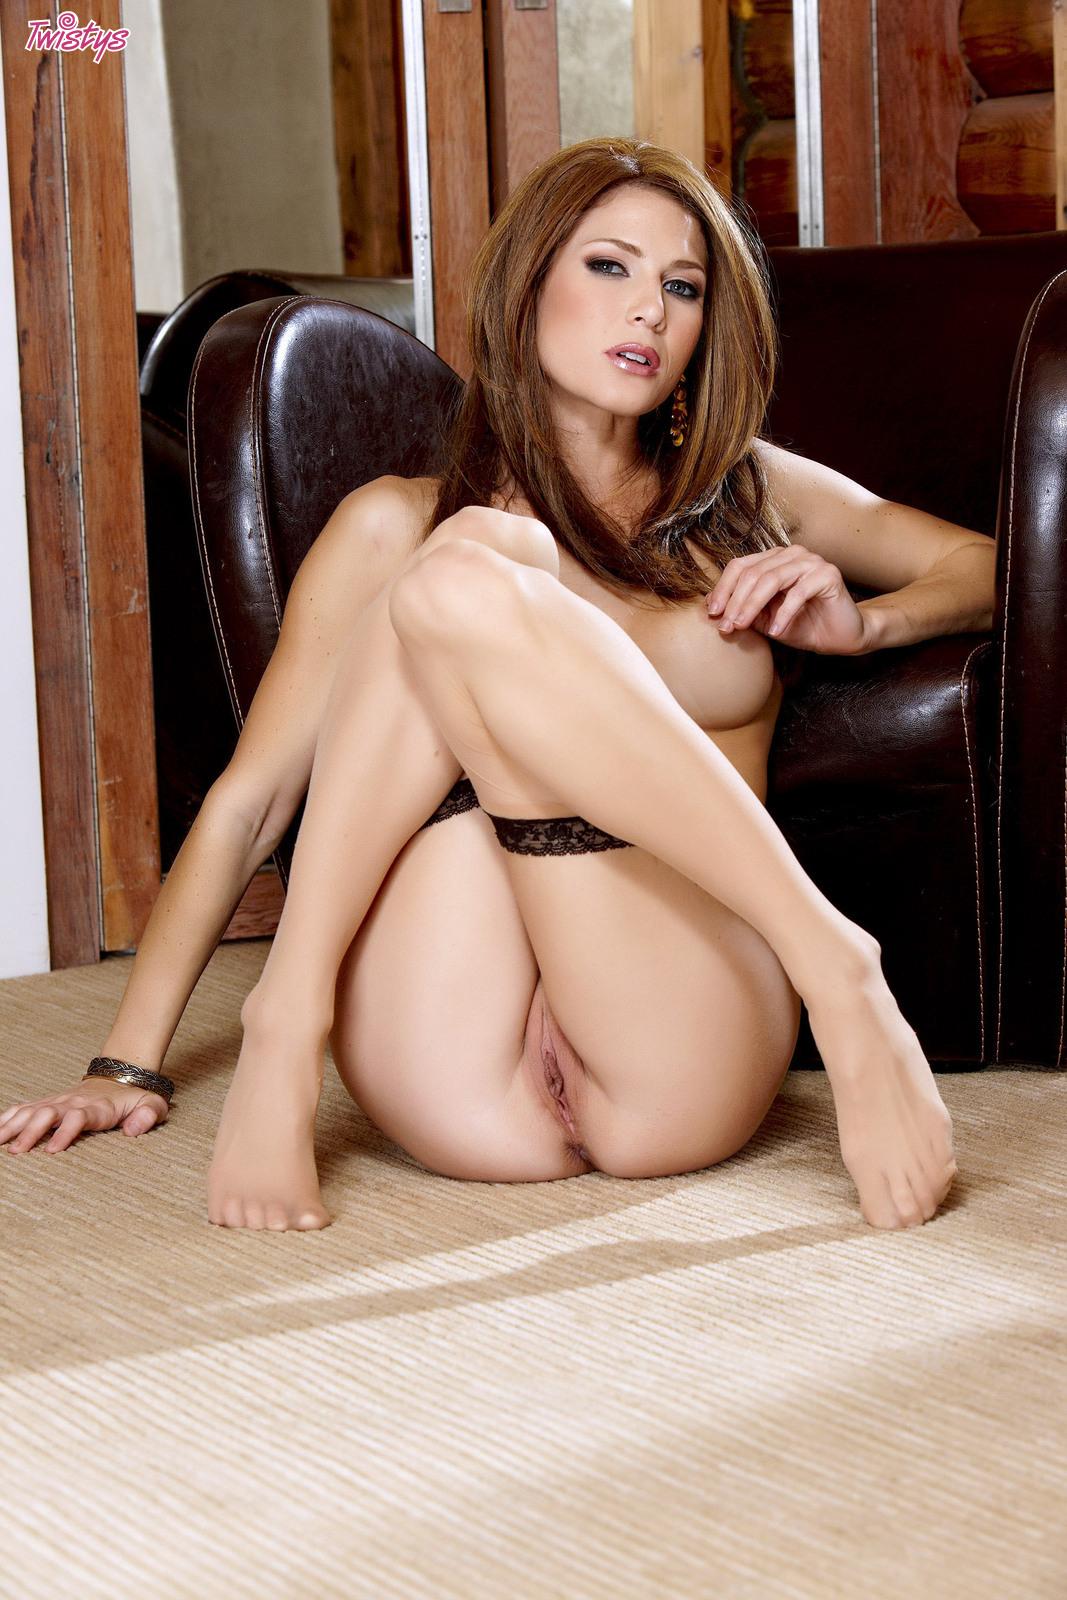 Pantyhose erotic handjob